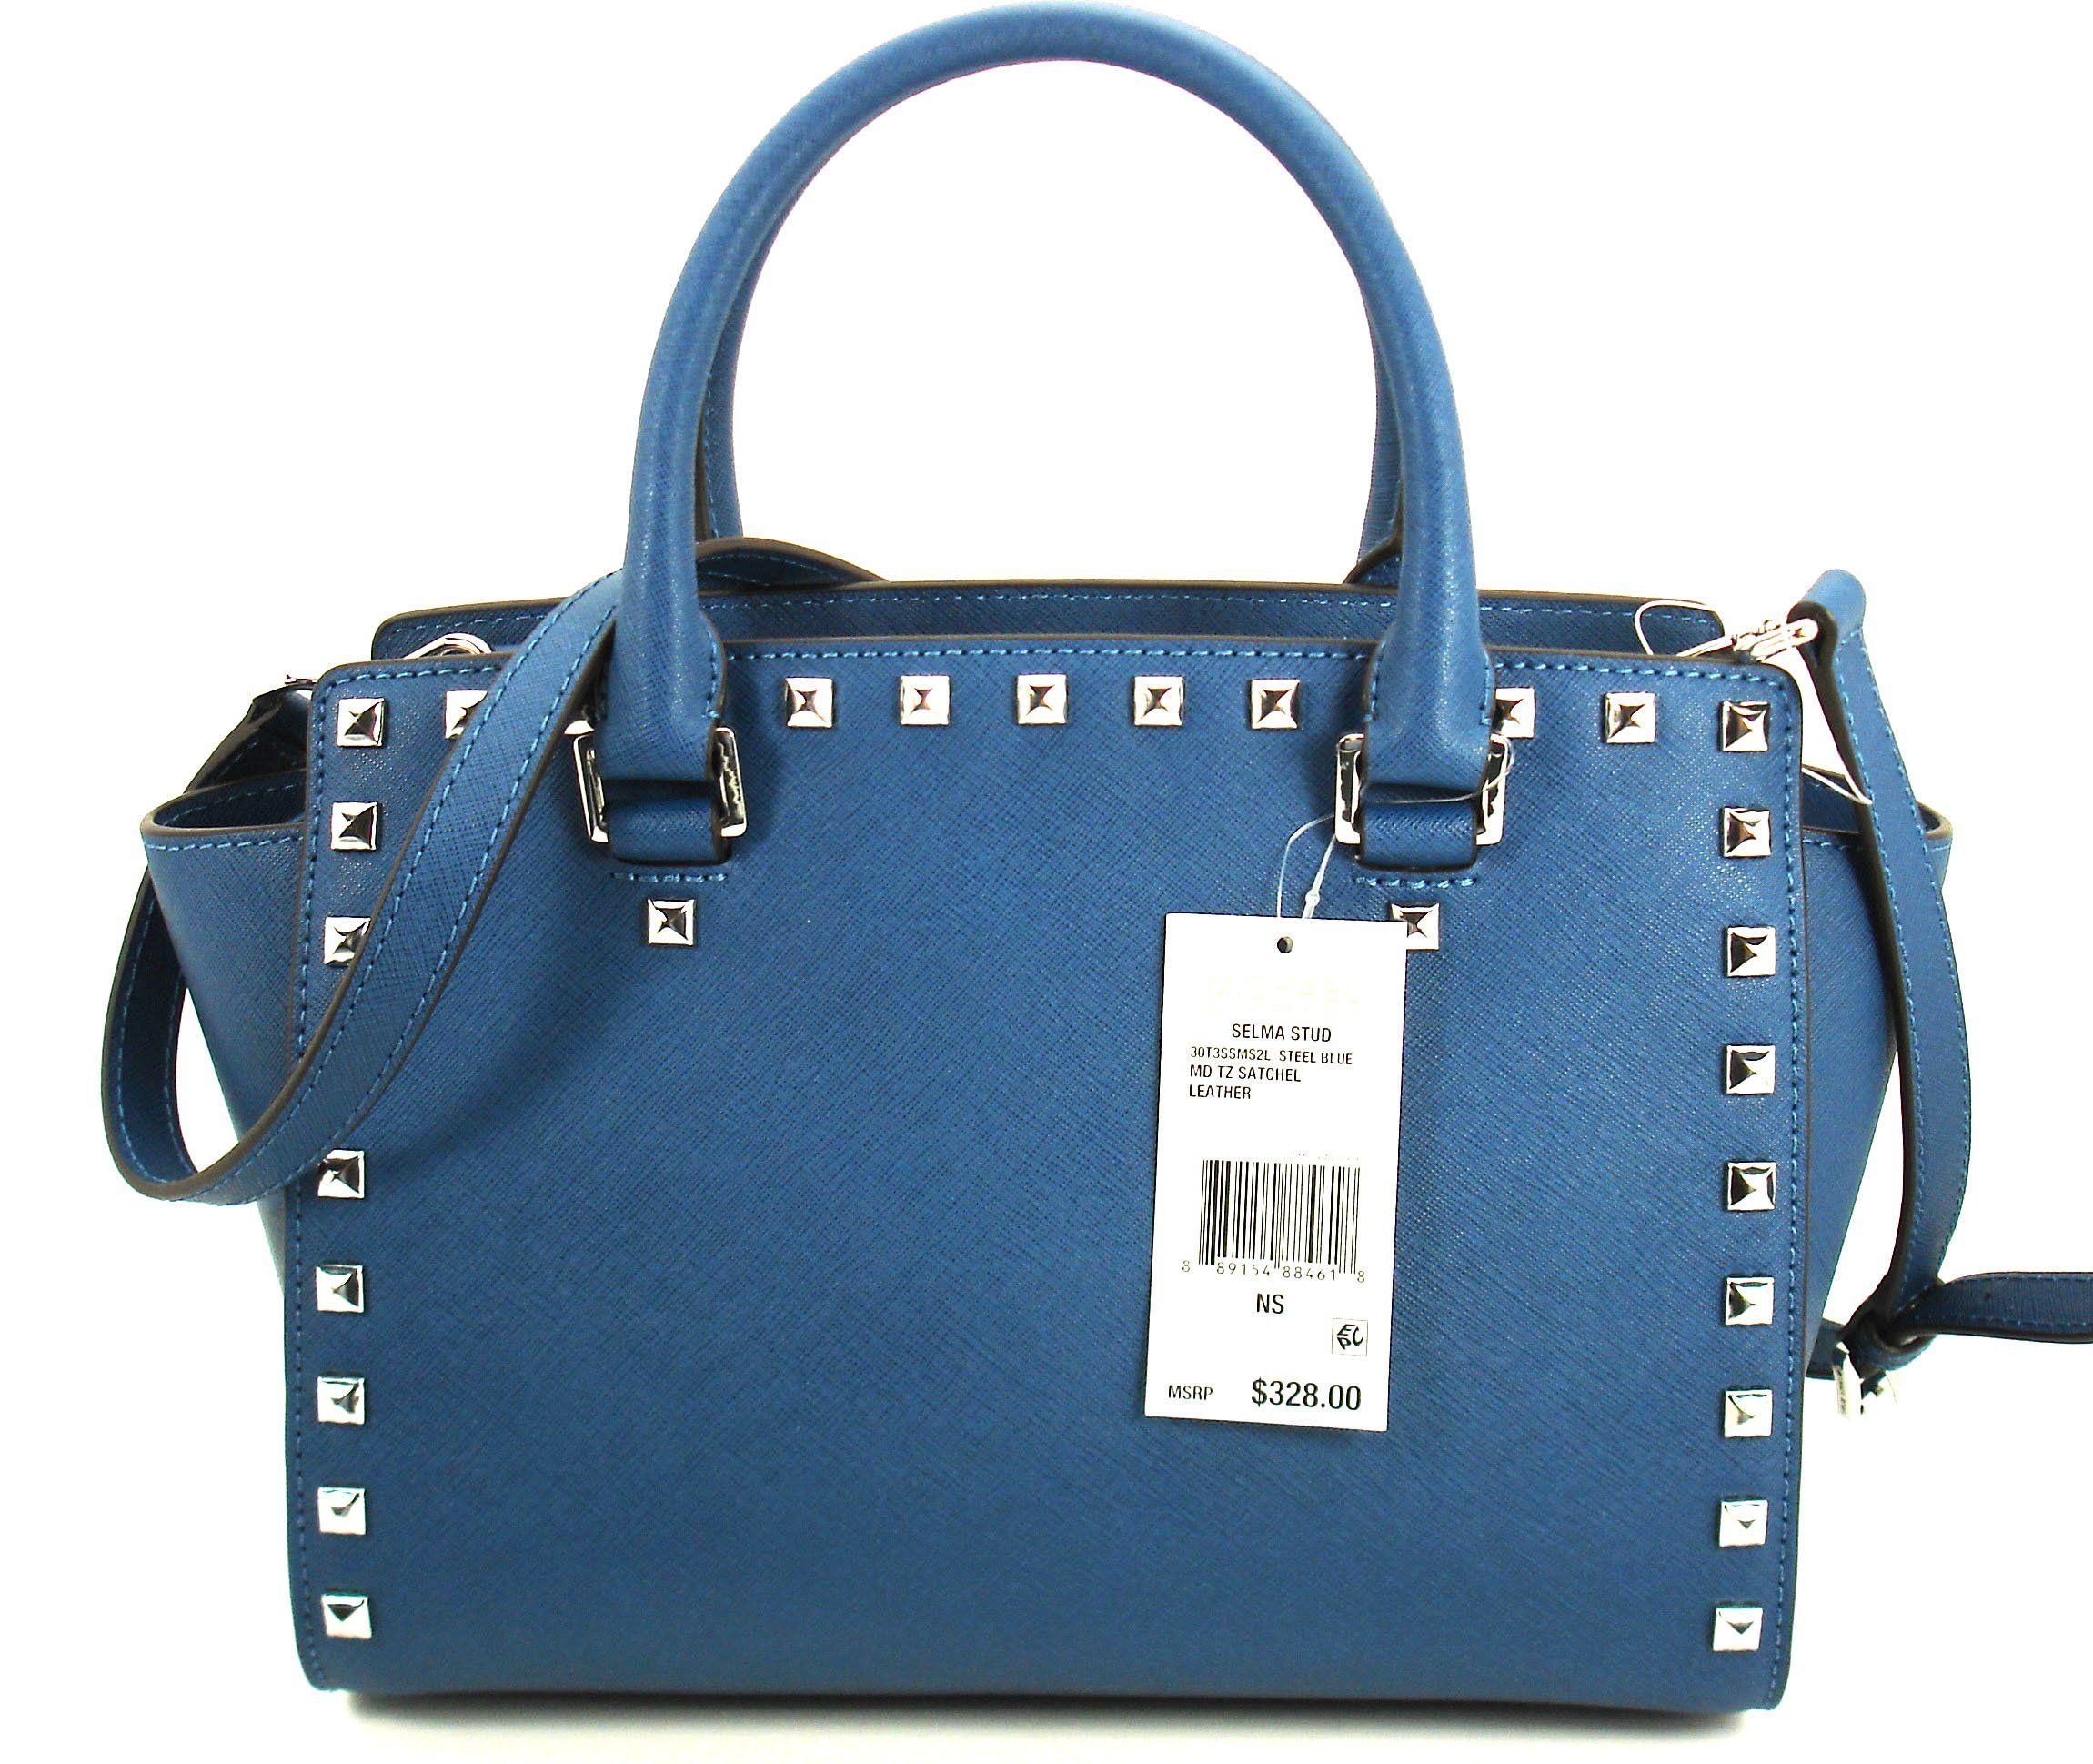 33c36393001a Michael Kors Selma Stud Medium Top Zip Saffiano Leather Satchel Steel Blue     To view